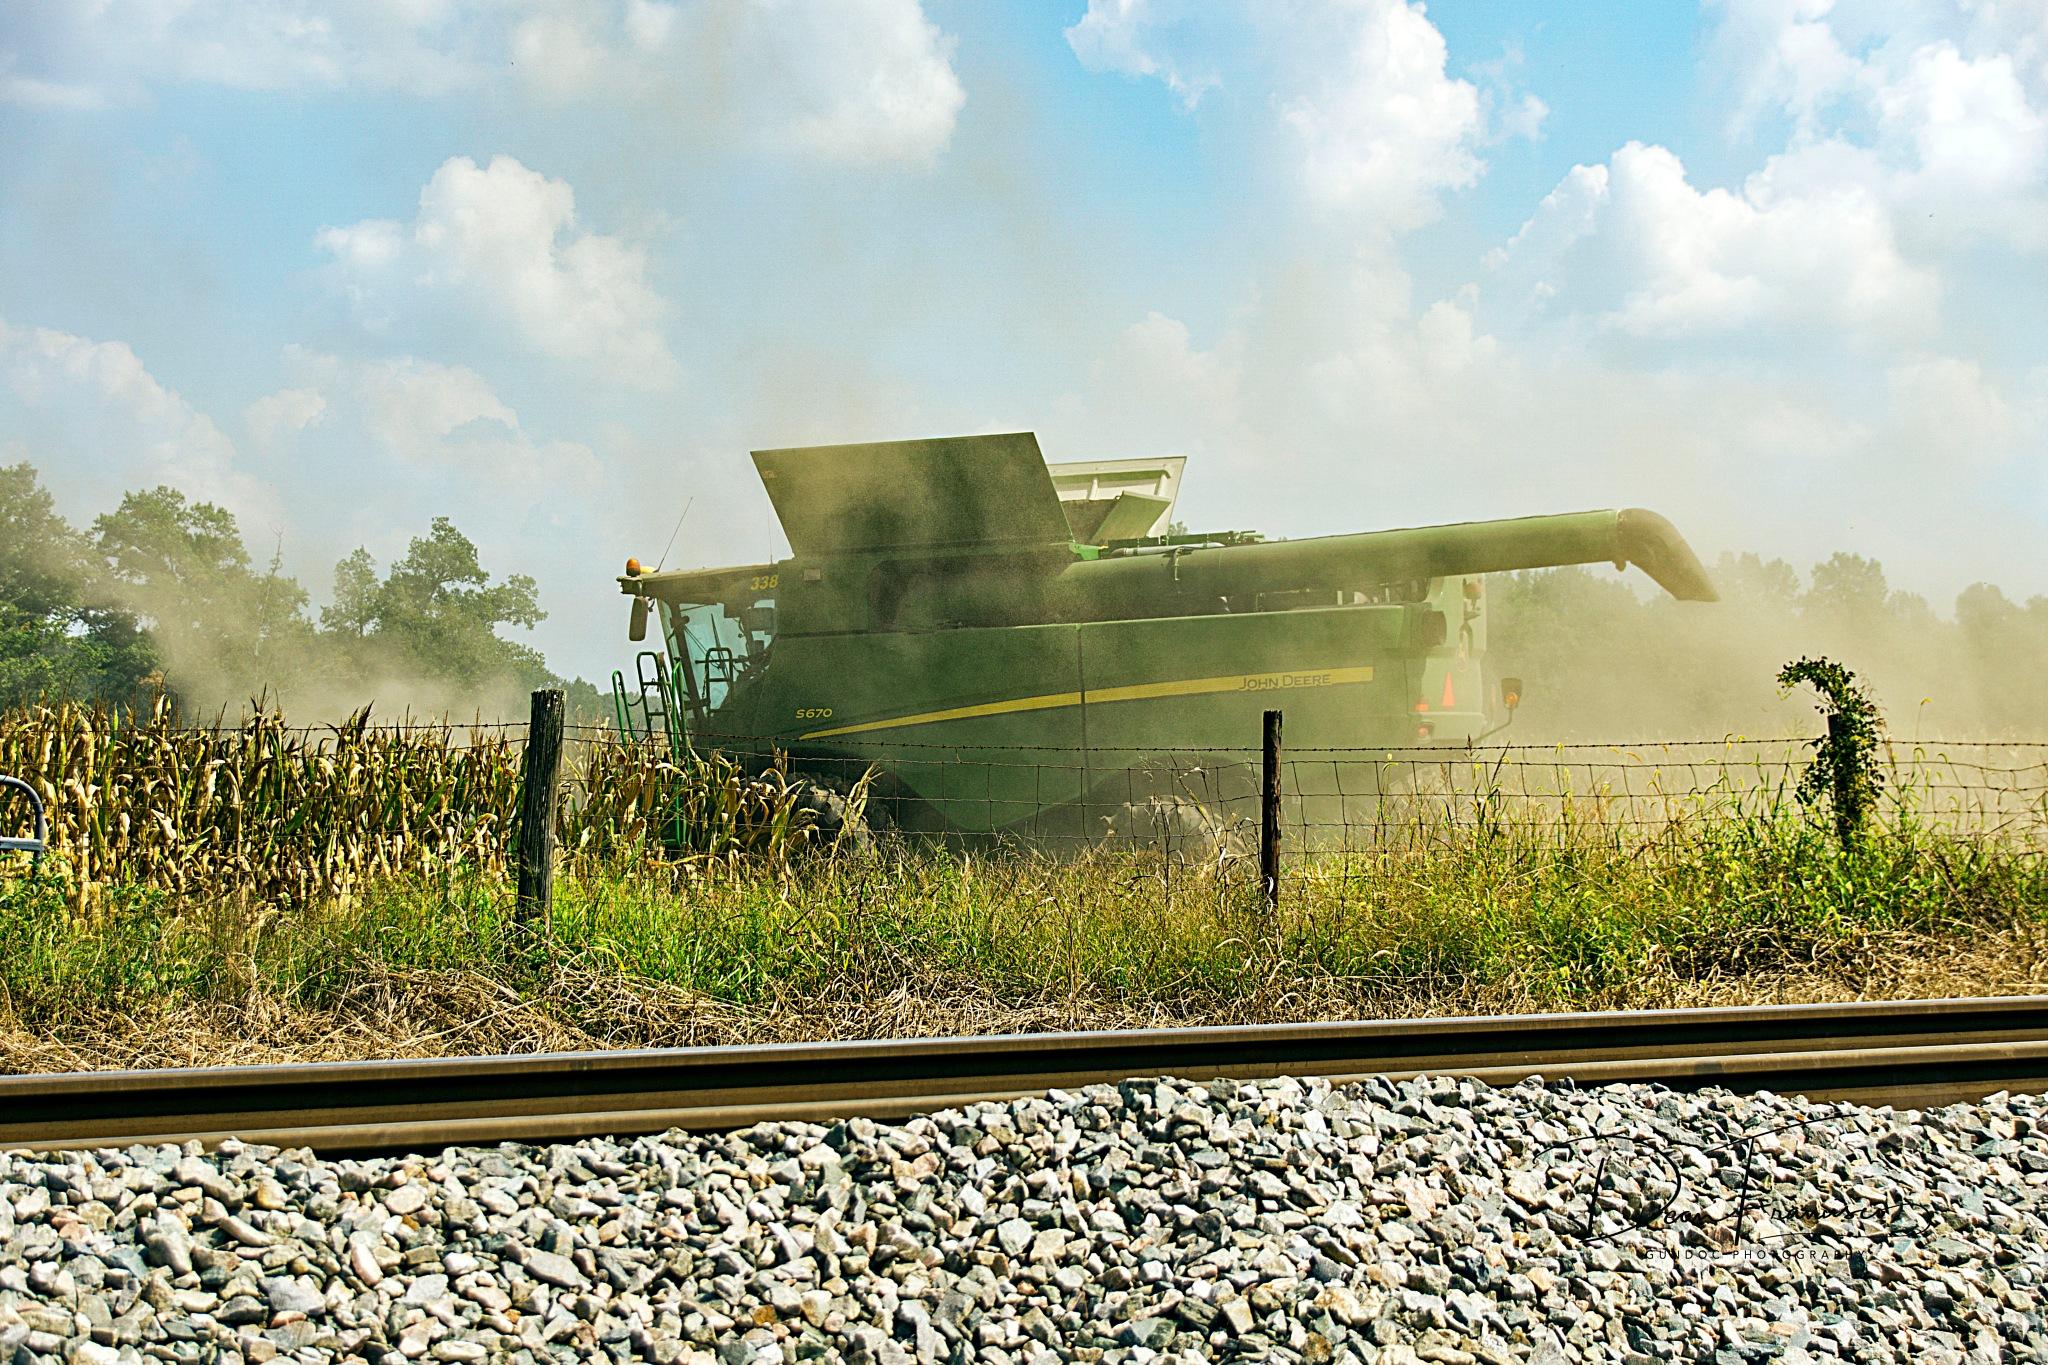 John Deere Corn Harvester staring a new field by Dean Francisco